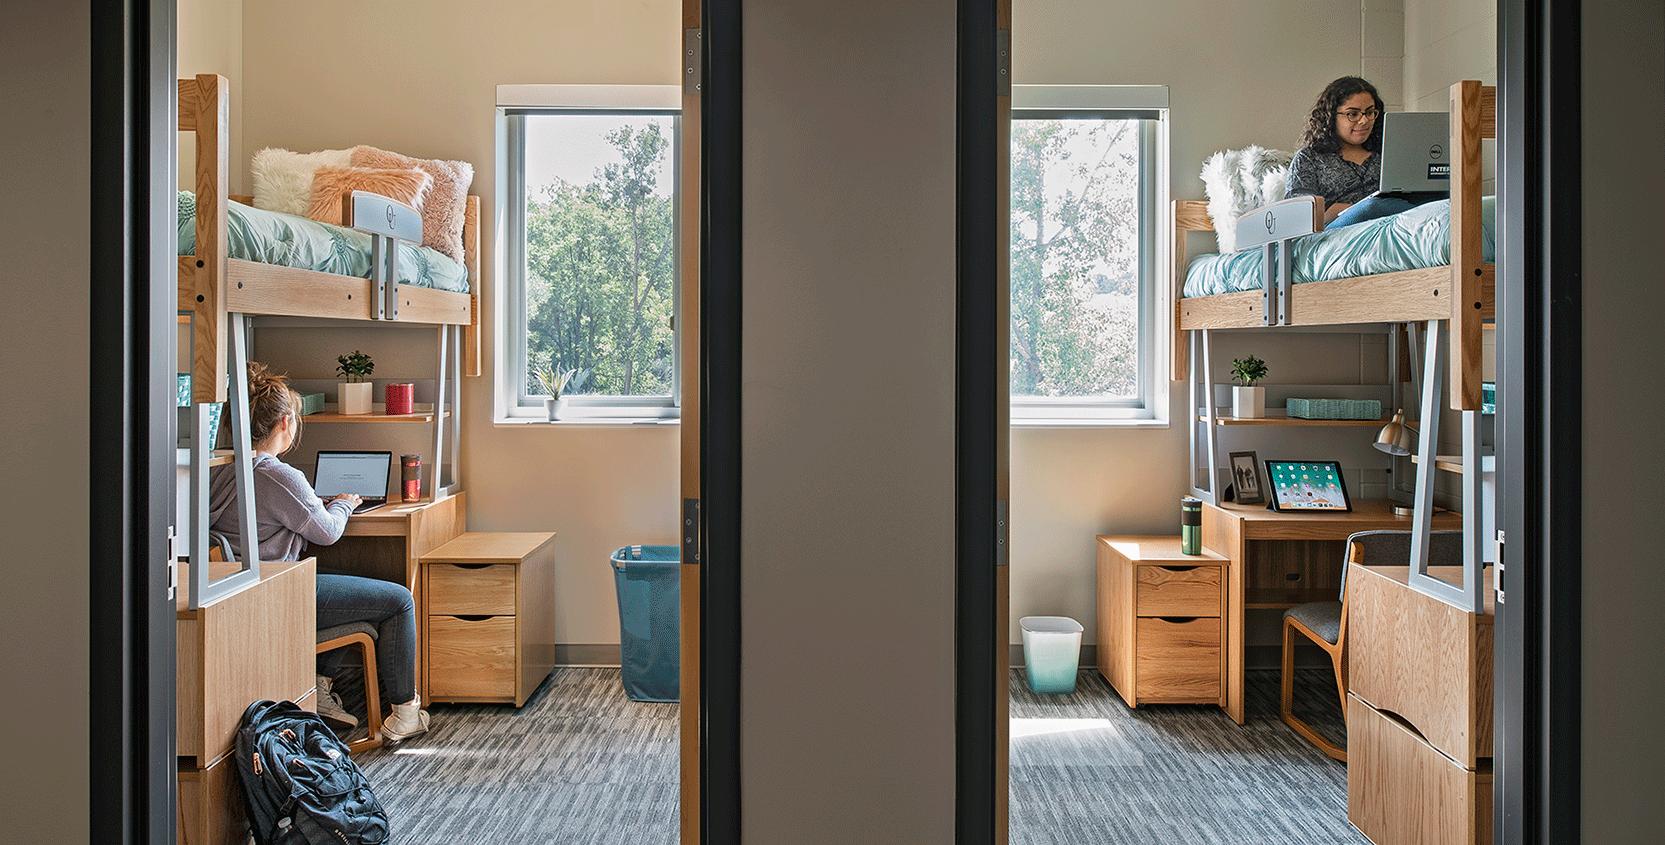 OU-Hillcrest-Residence-Hall-Dorm-Room-1665x845